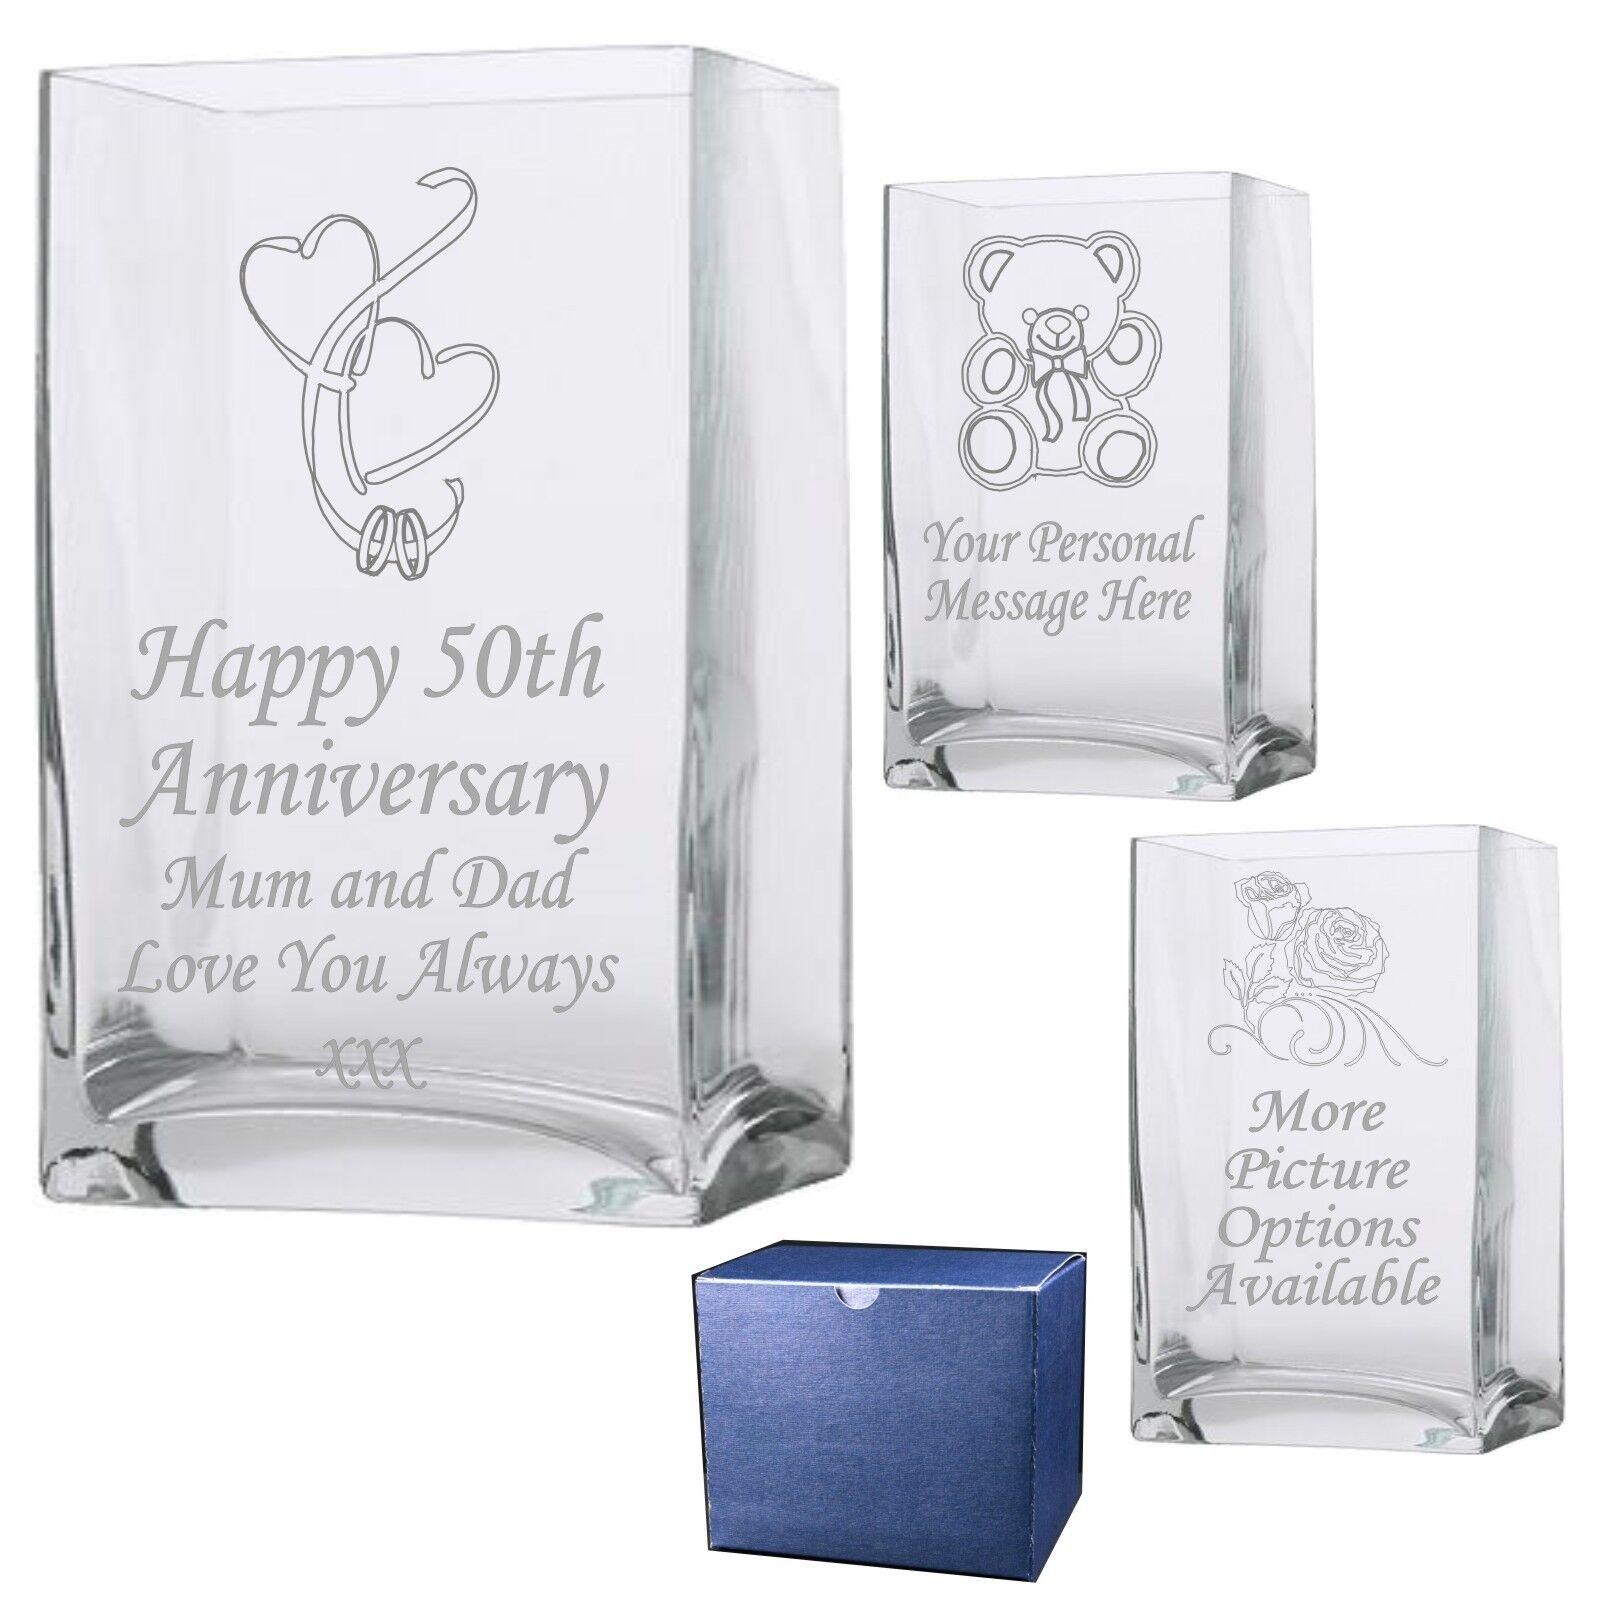 Vase rectangle personnalisé 40e 45e 50e 55e 60e anniversaire de mariage cadeau